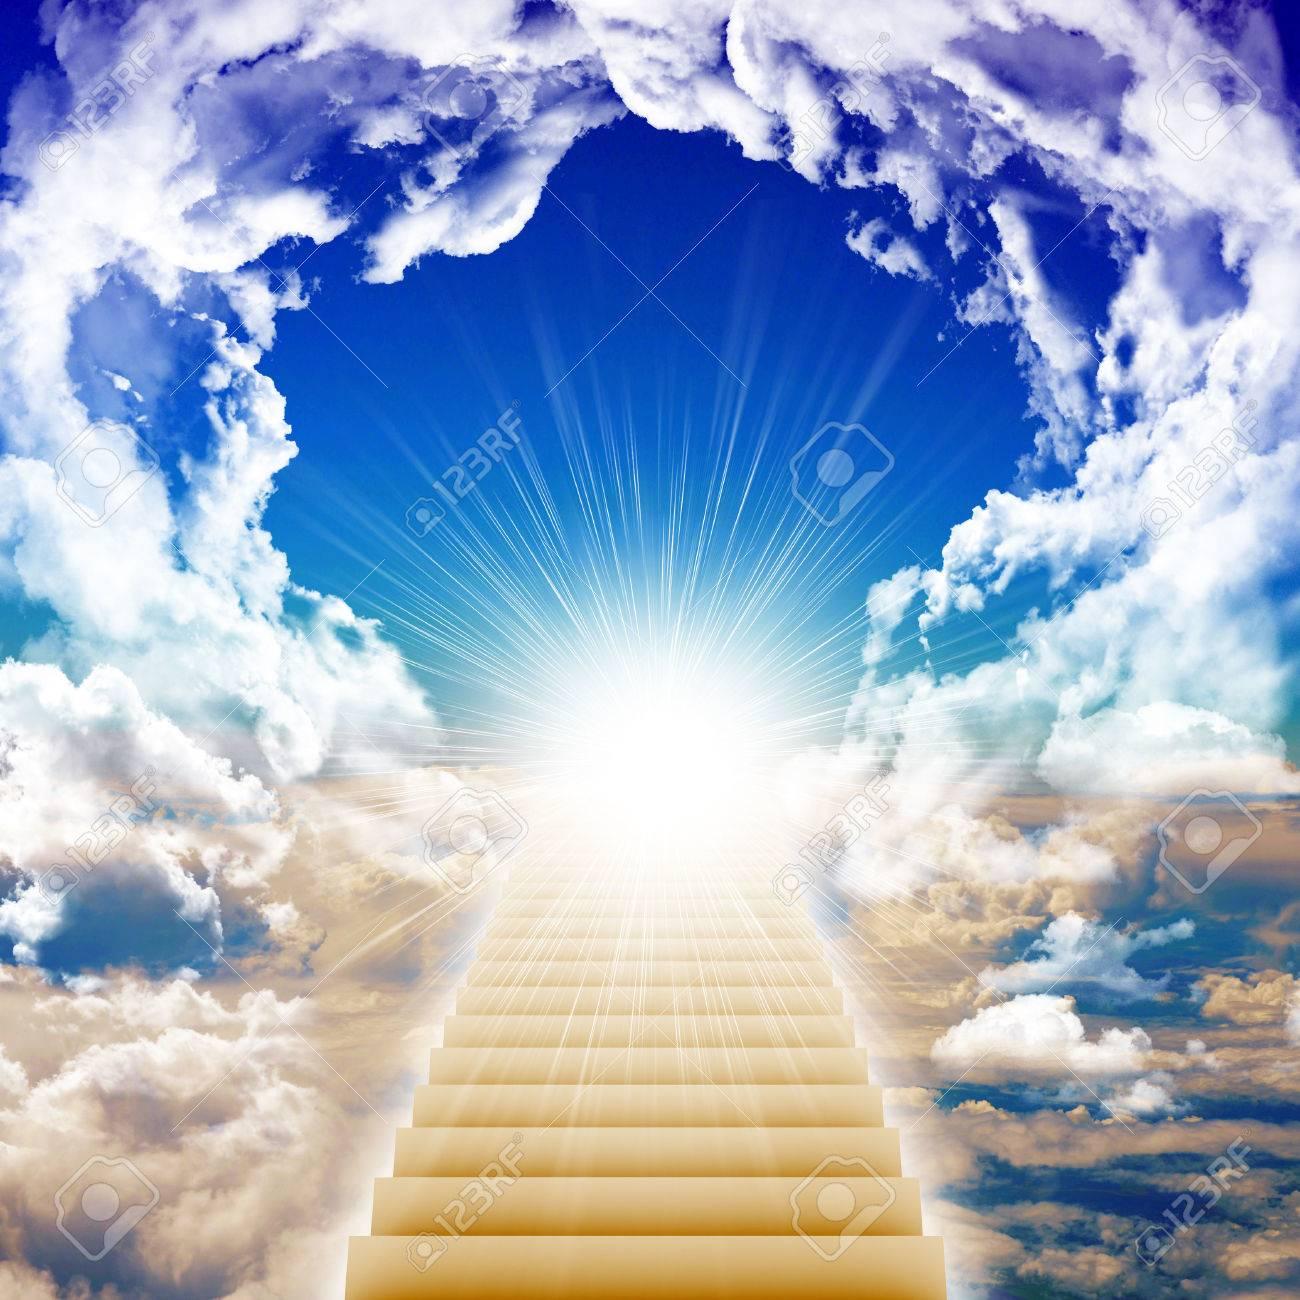 Watch Stairway to Heaven video